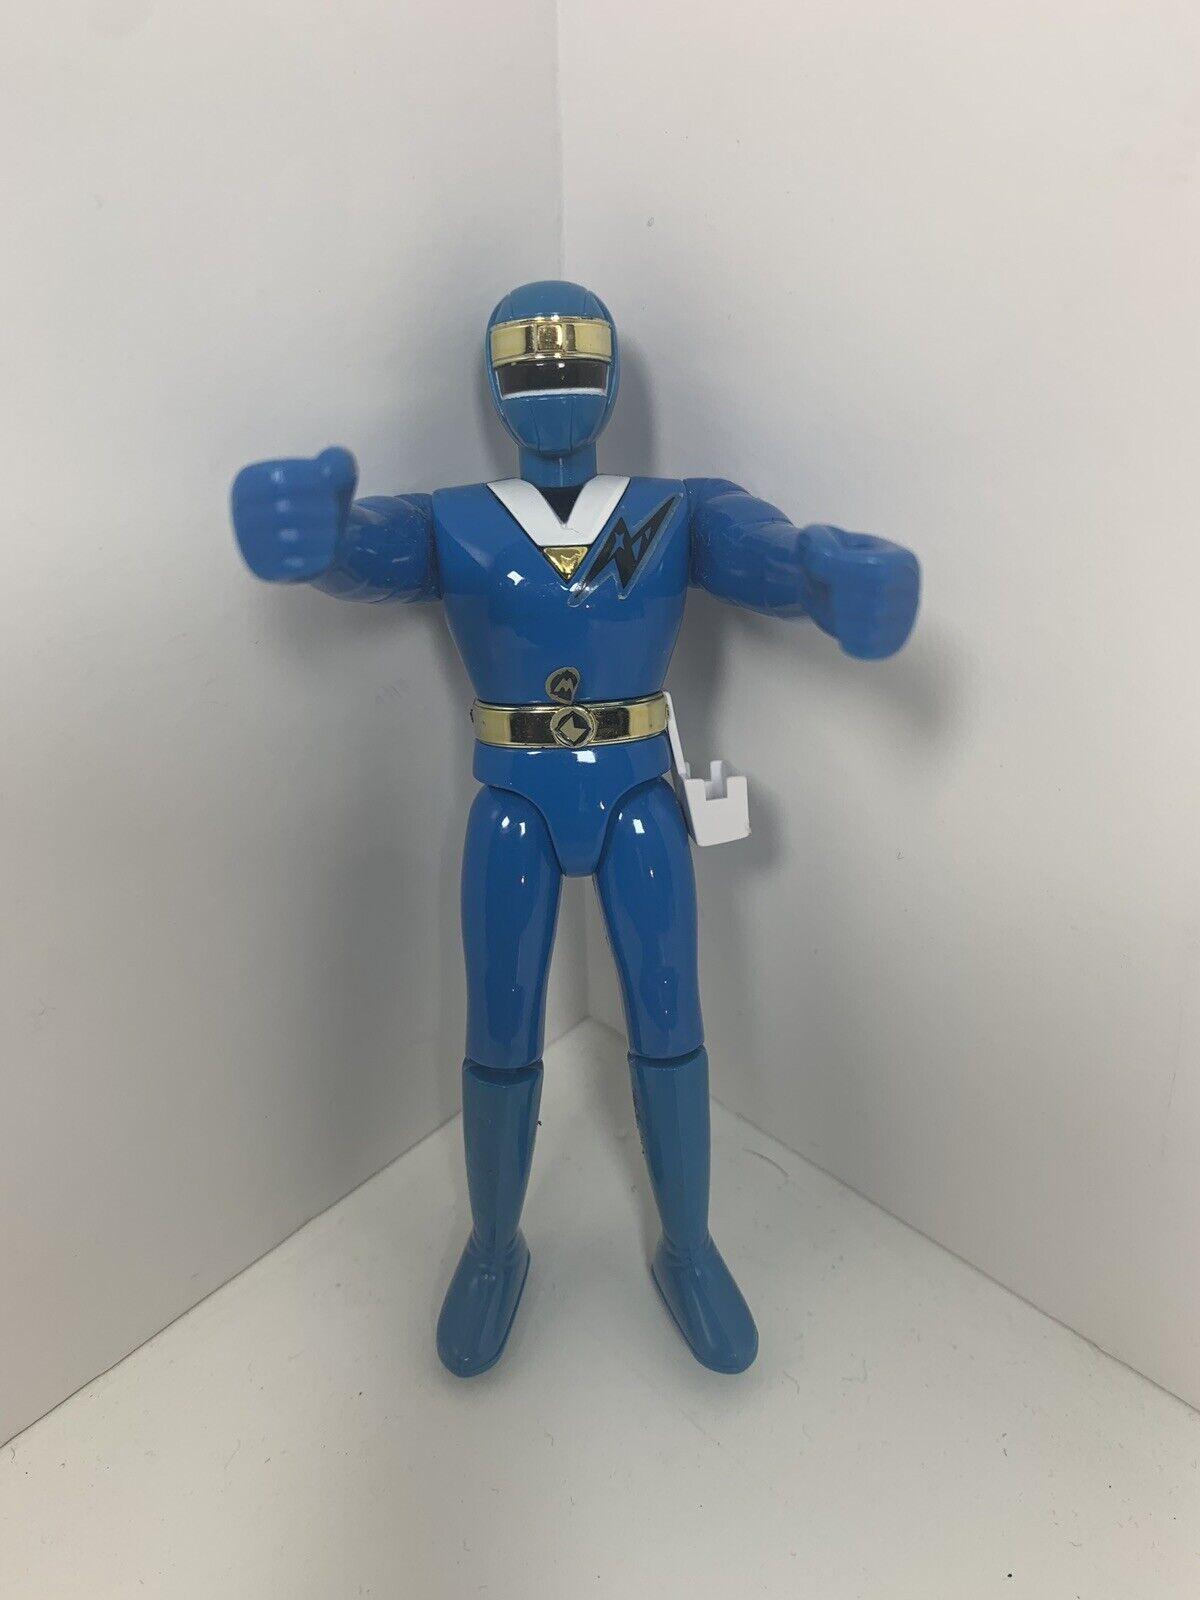 Bandai Mighty Morphin Power Rangers Ninja Samurai 1993 Japan azul Ranger Raro